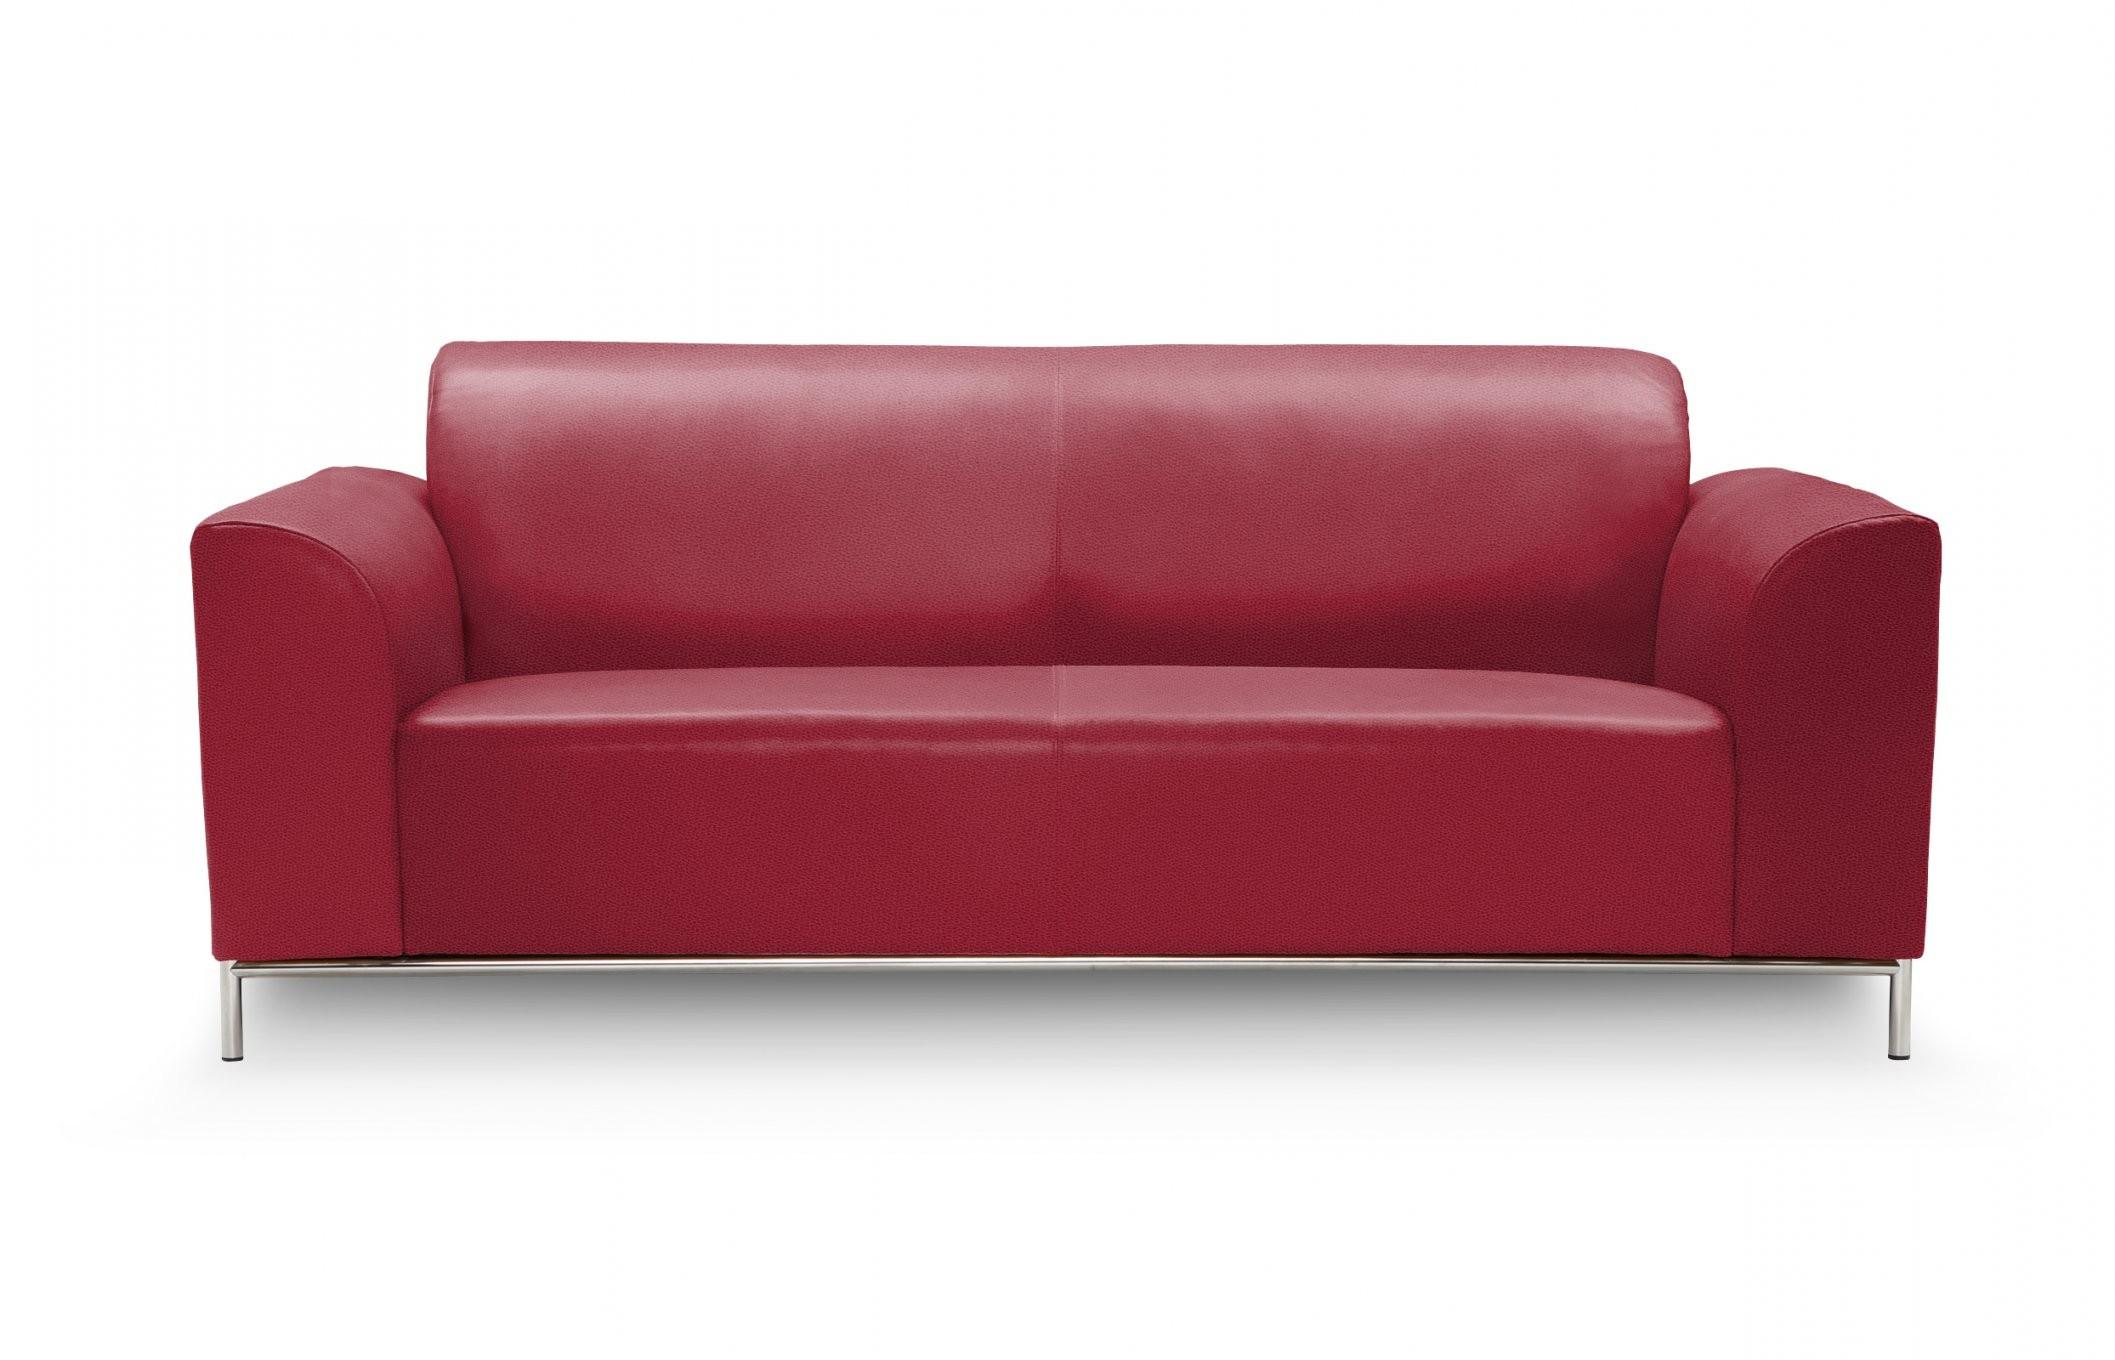 2Sitzer Glanzstück Leder Klassik Tomaat  Sitzfeldt von 2 Sitzer Sofa Rot Bild